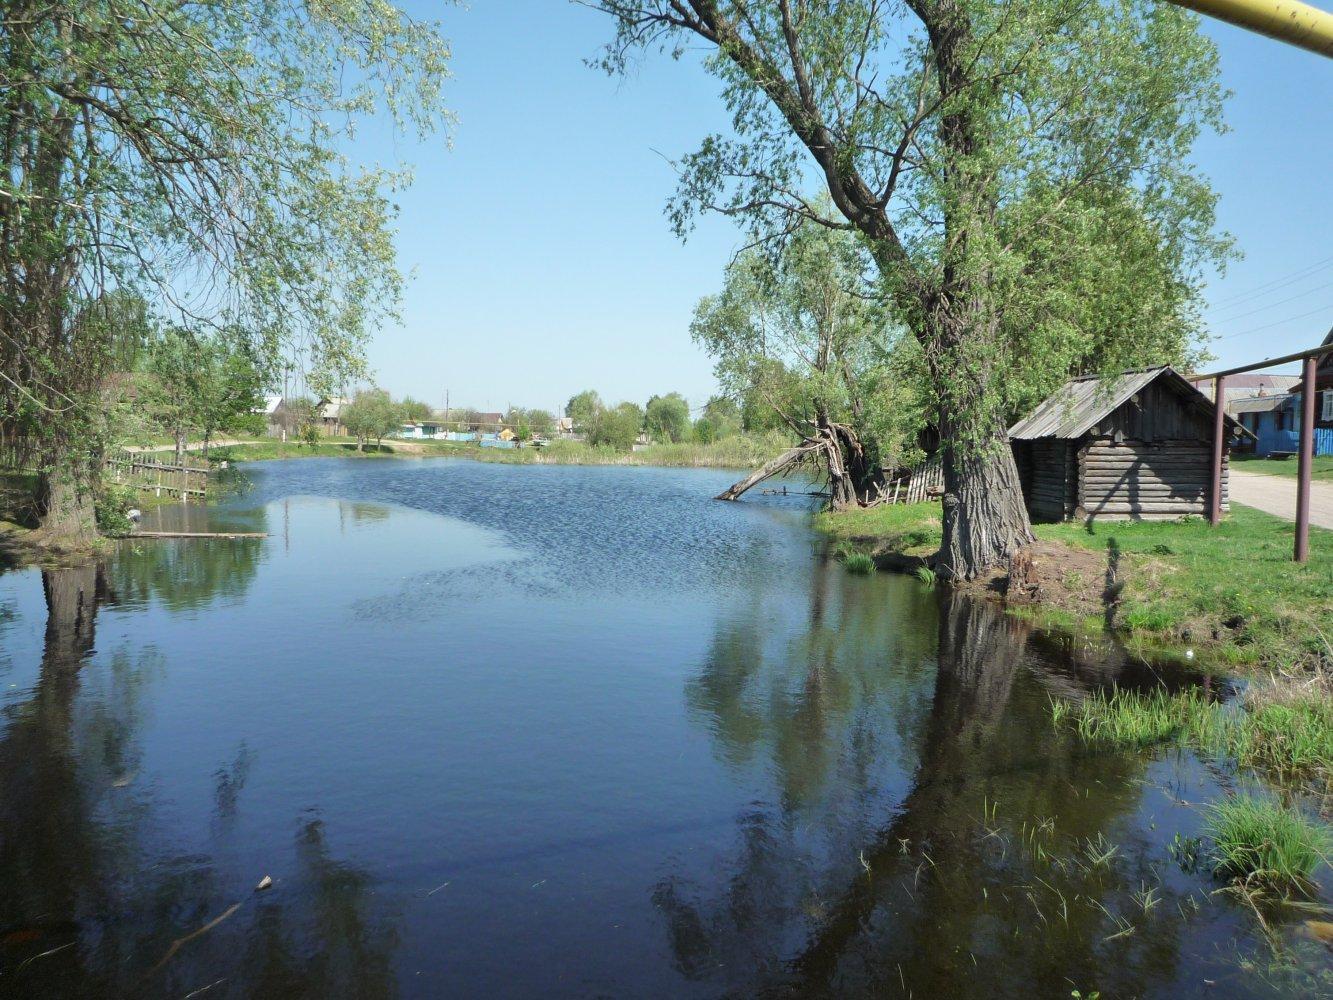 Фото P1030111.JPG. Россия, Марий Эл республика, Малые Маламасы, Unnamed Road